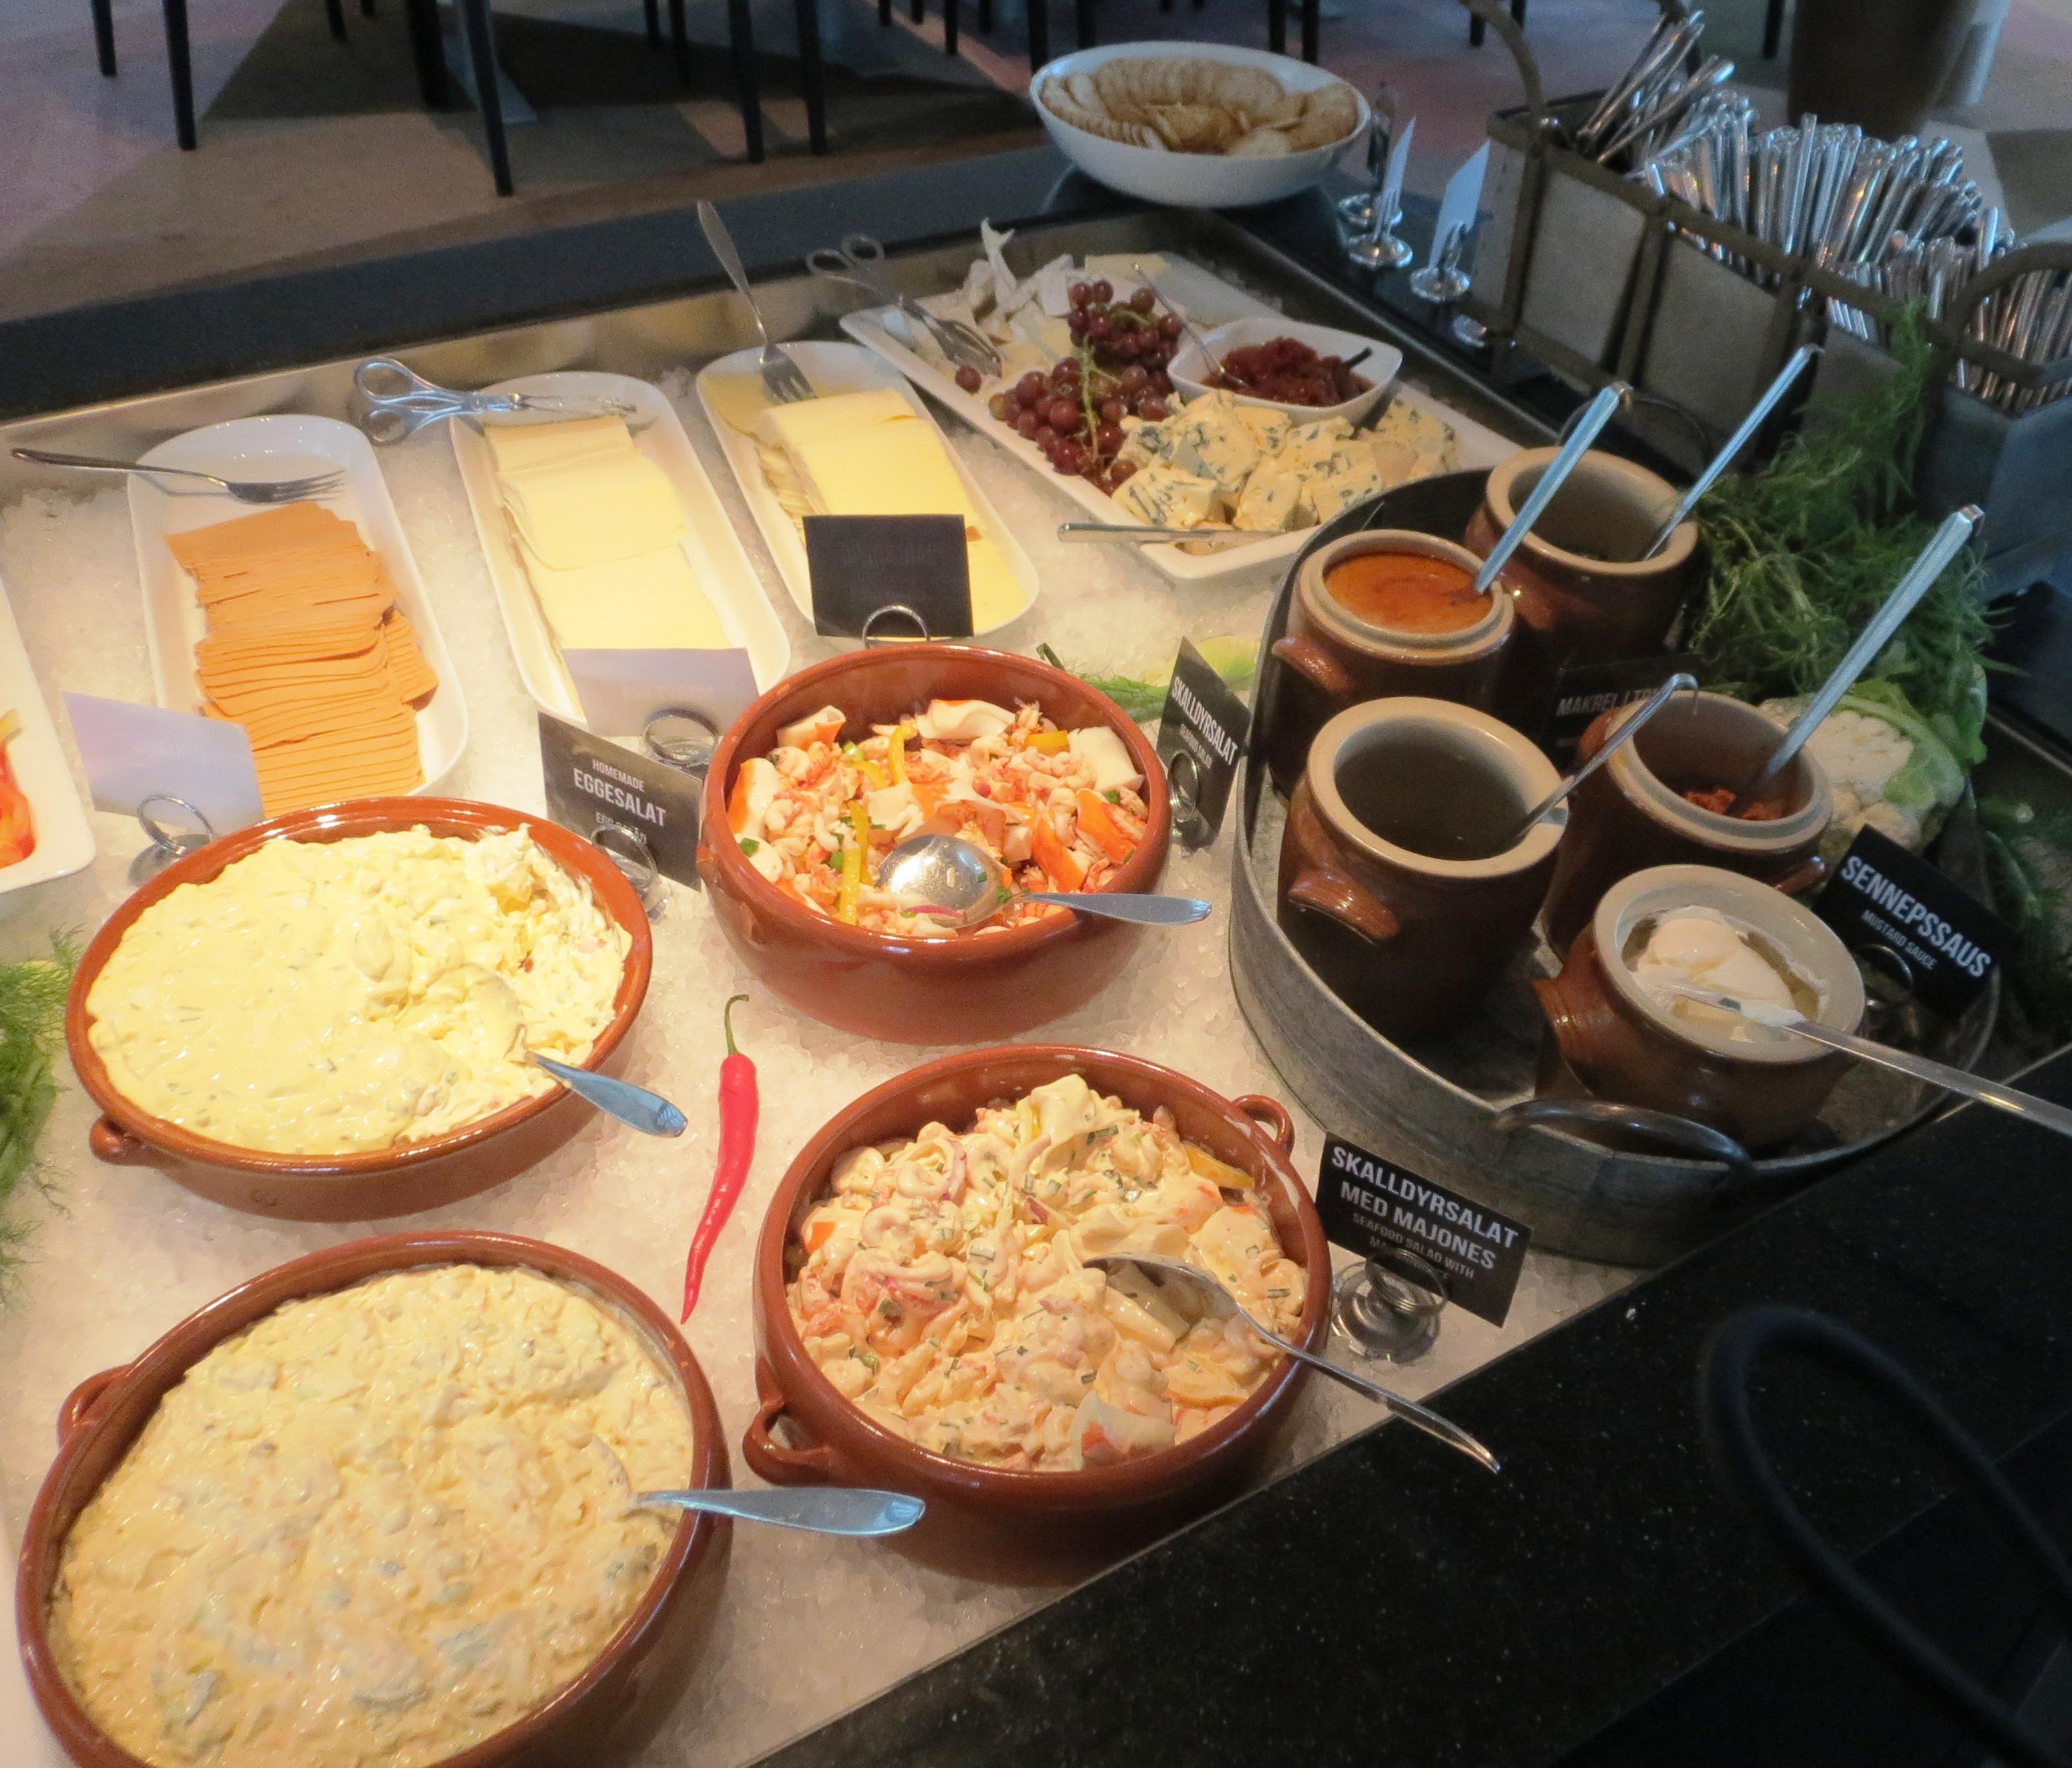 Clarion Hotel Breakfast